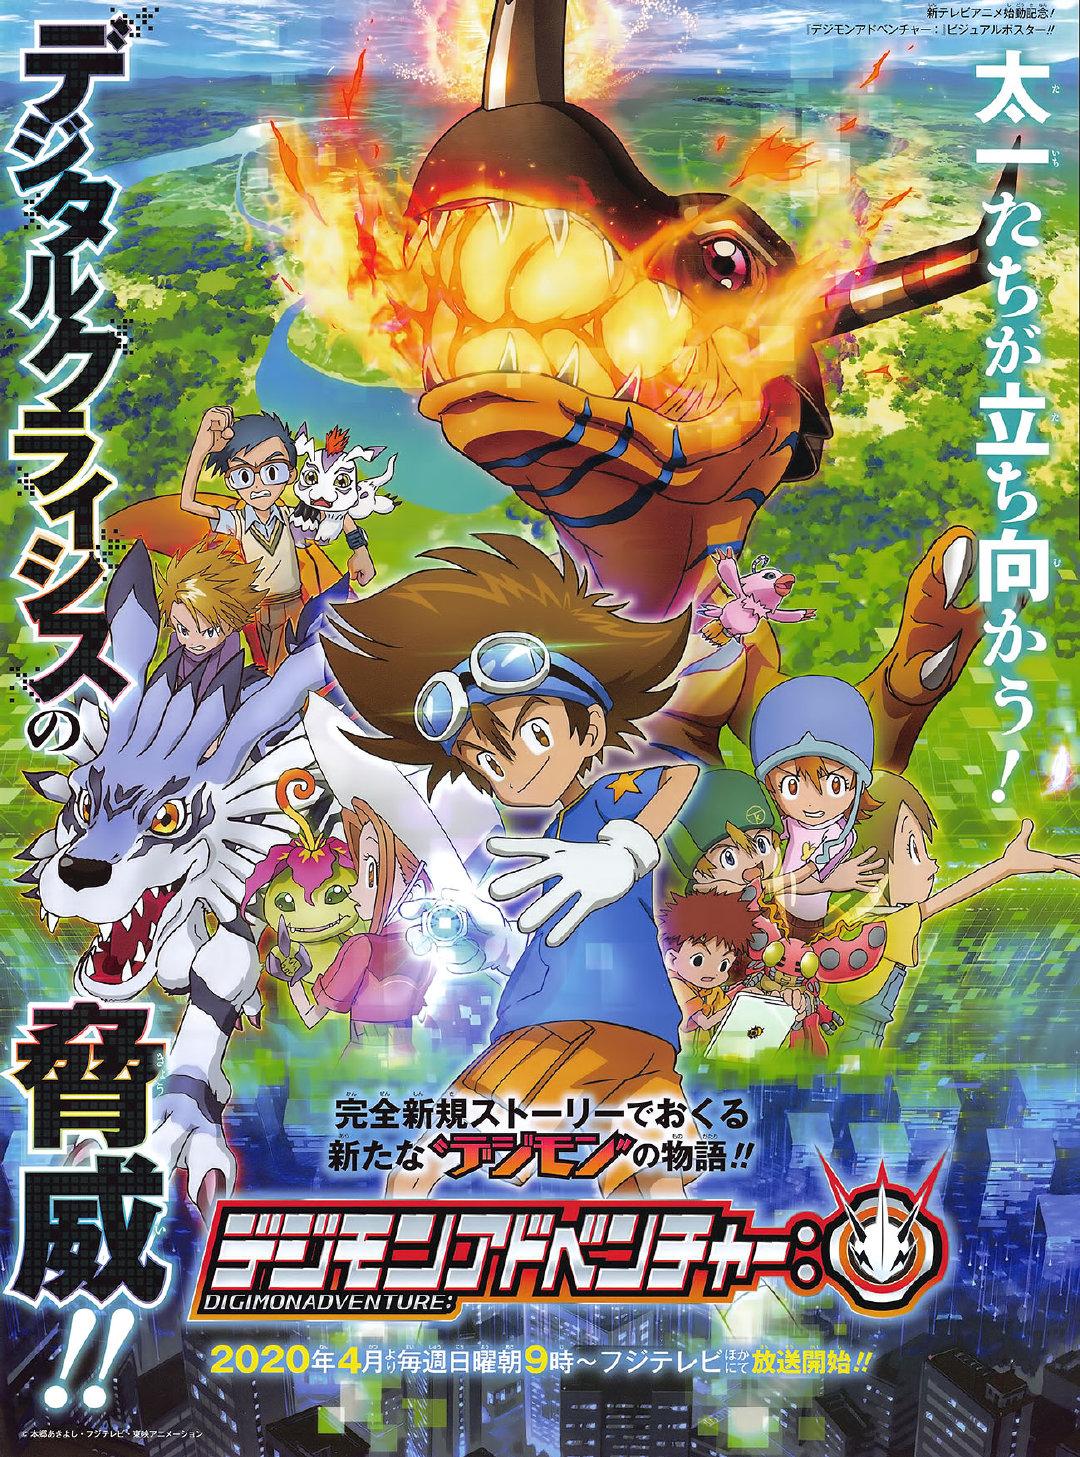 Digimon Adventure Reboot Poster